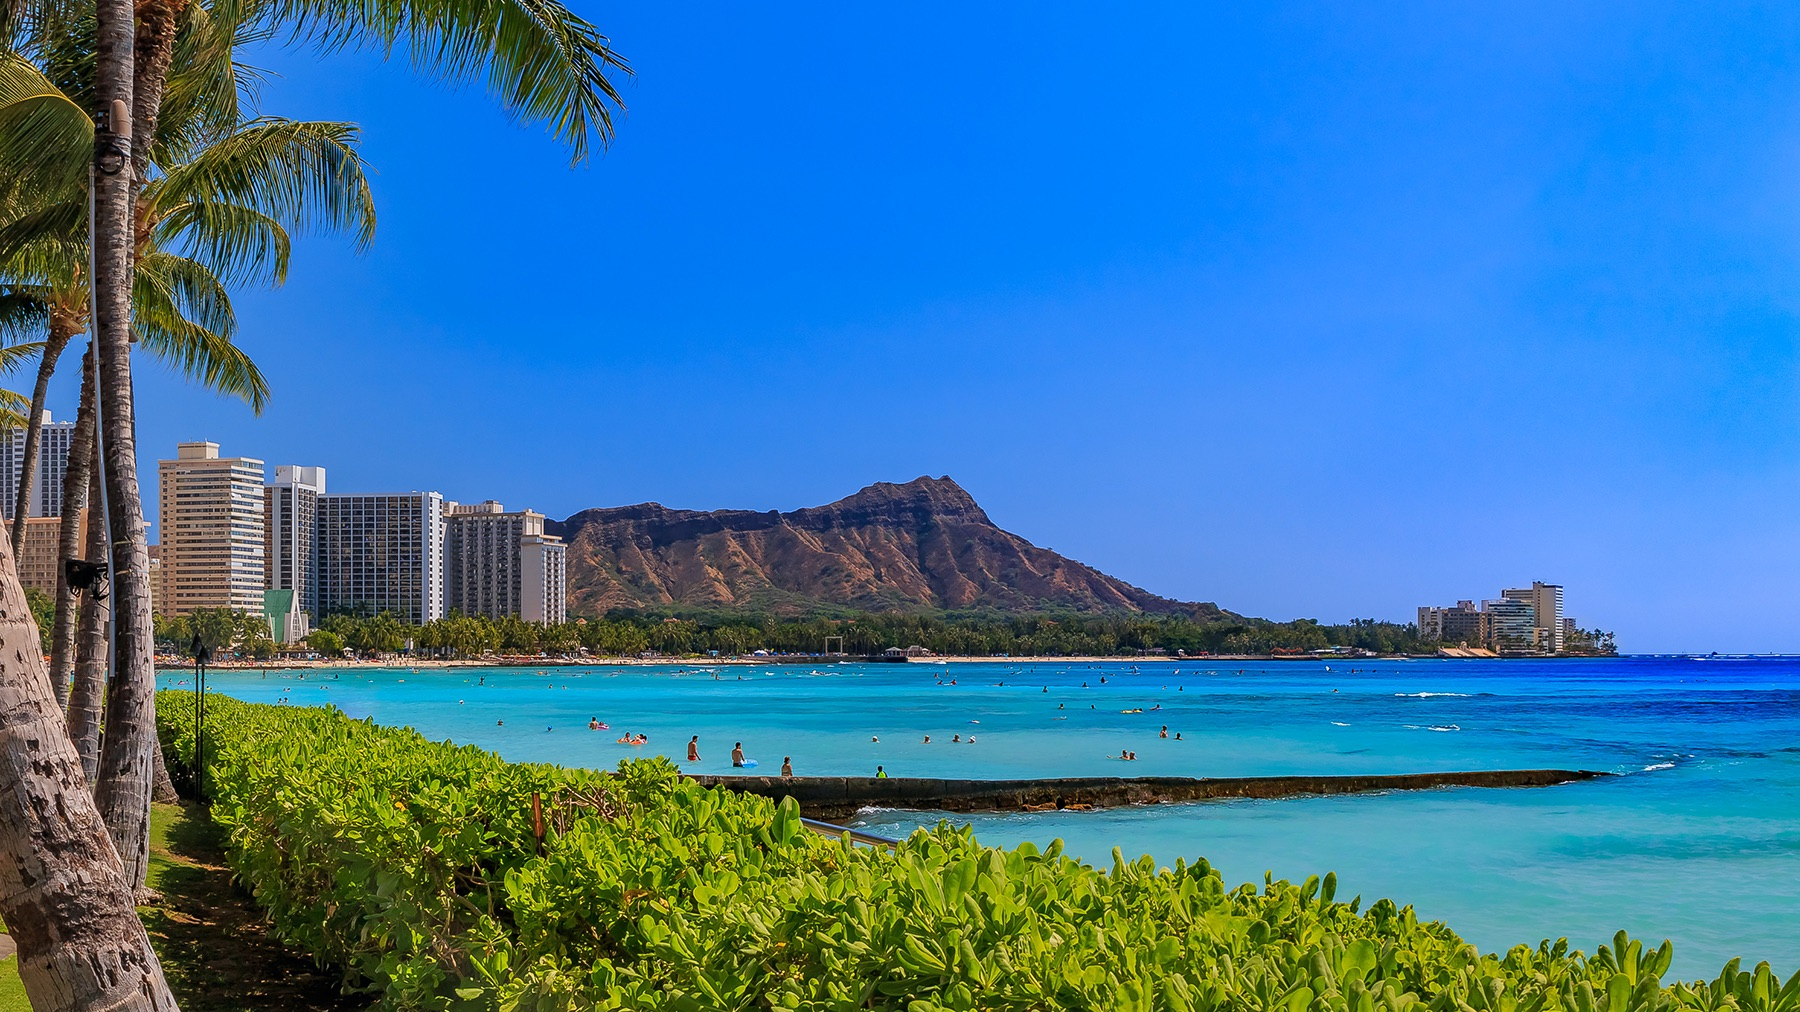 View of Waikiki Beach and Diamond Head in Honolulu, Hawaii, USA